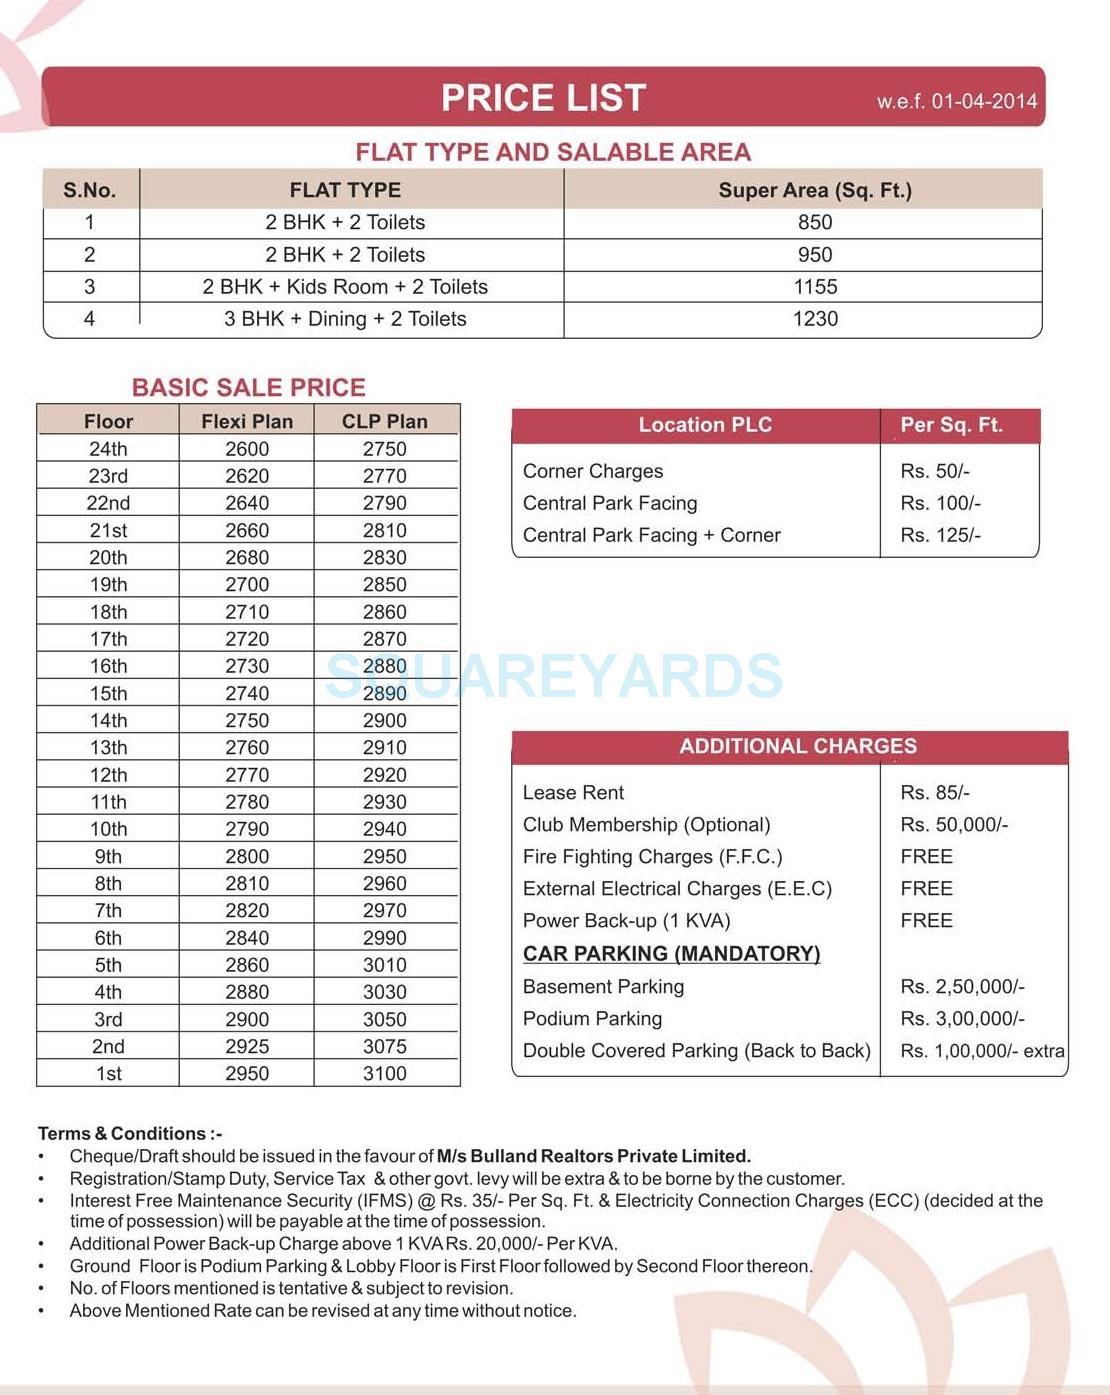 bulland calisto payment plan image2